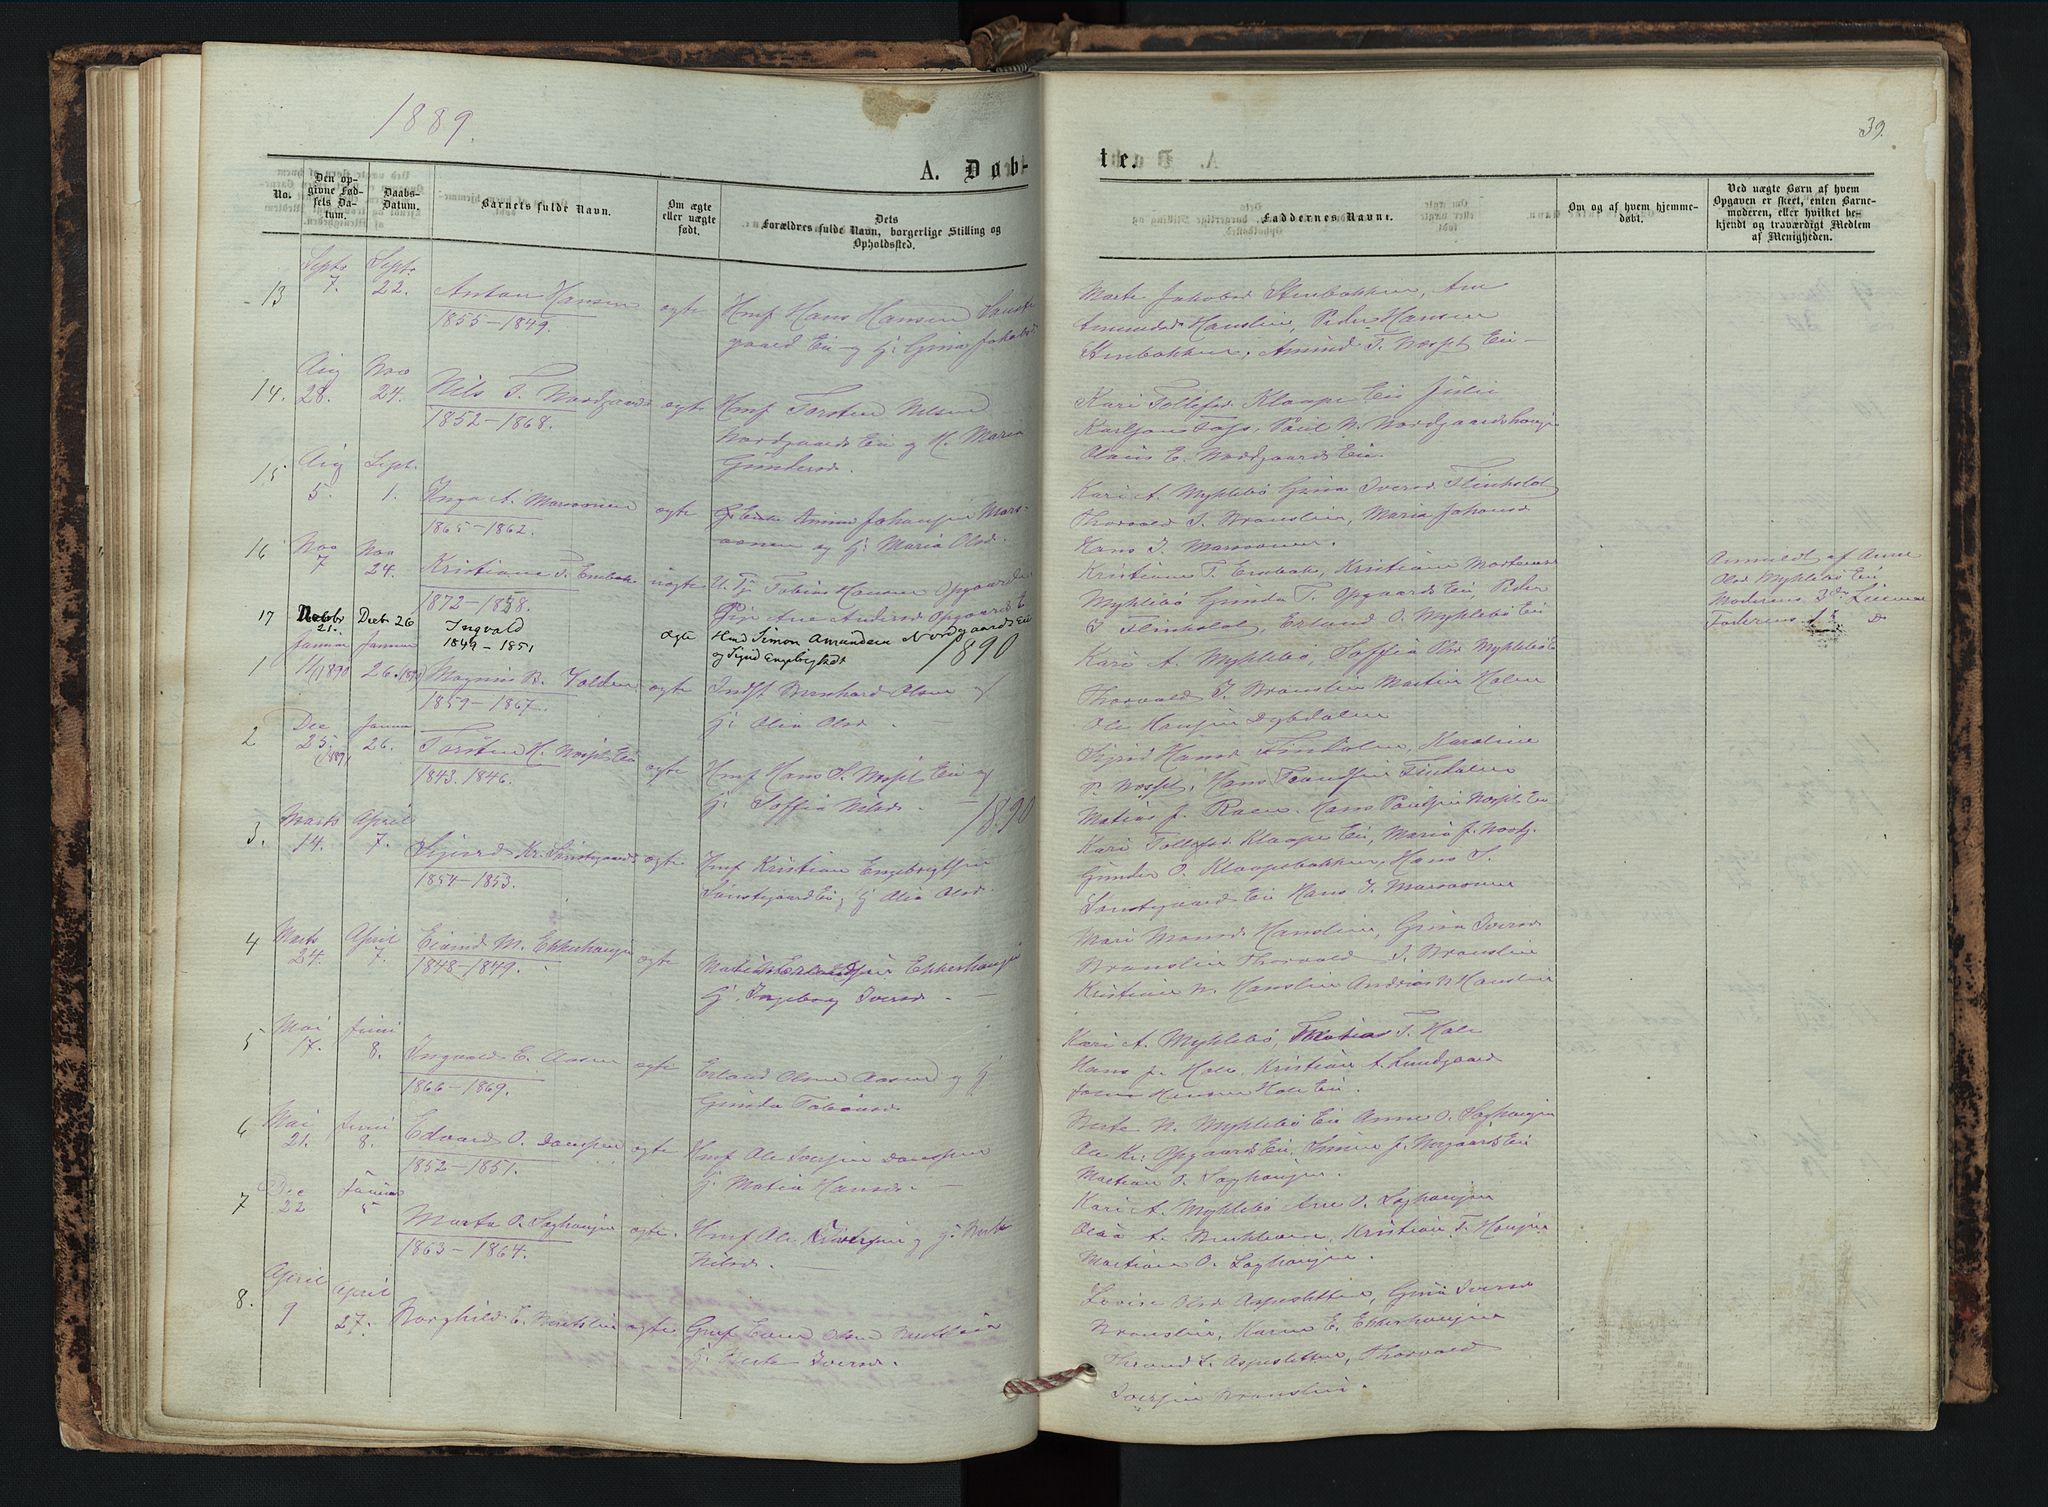 SAH, Vestre Gausdal prestekontor, Klokkerbok nr. 2, 1874-1897, s. 39